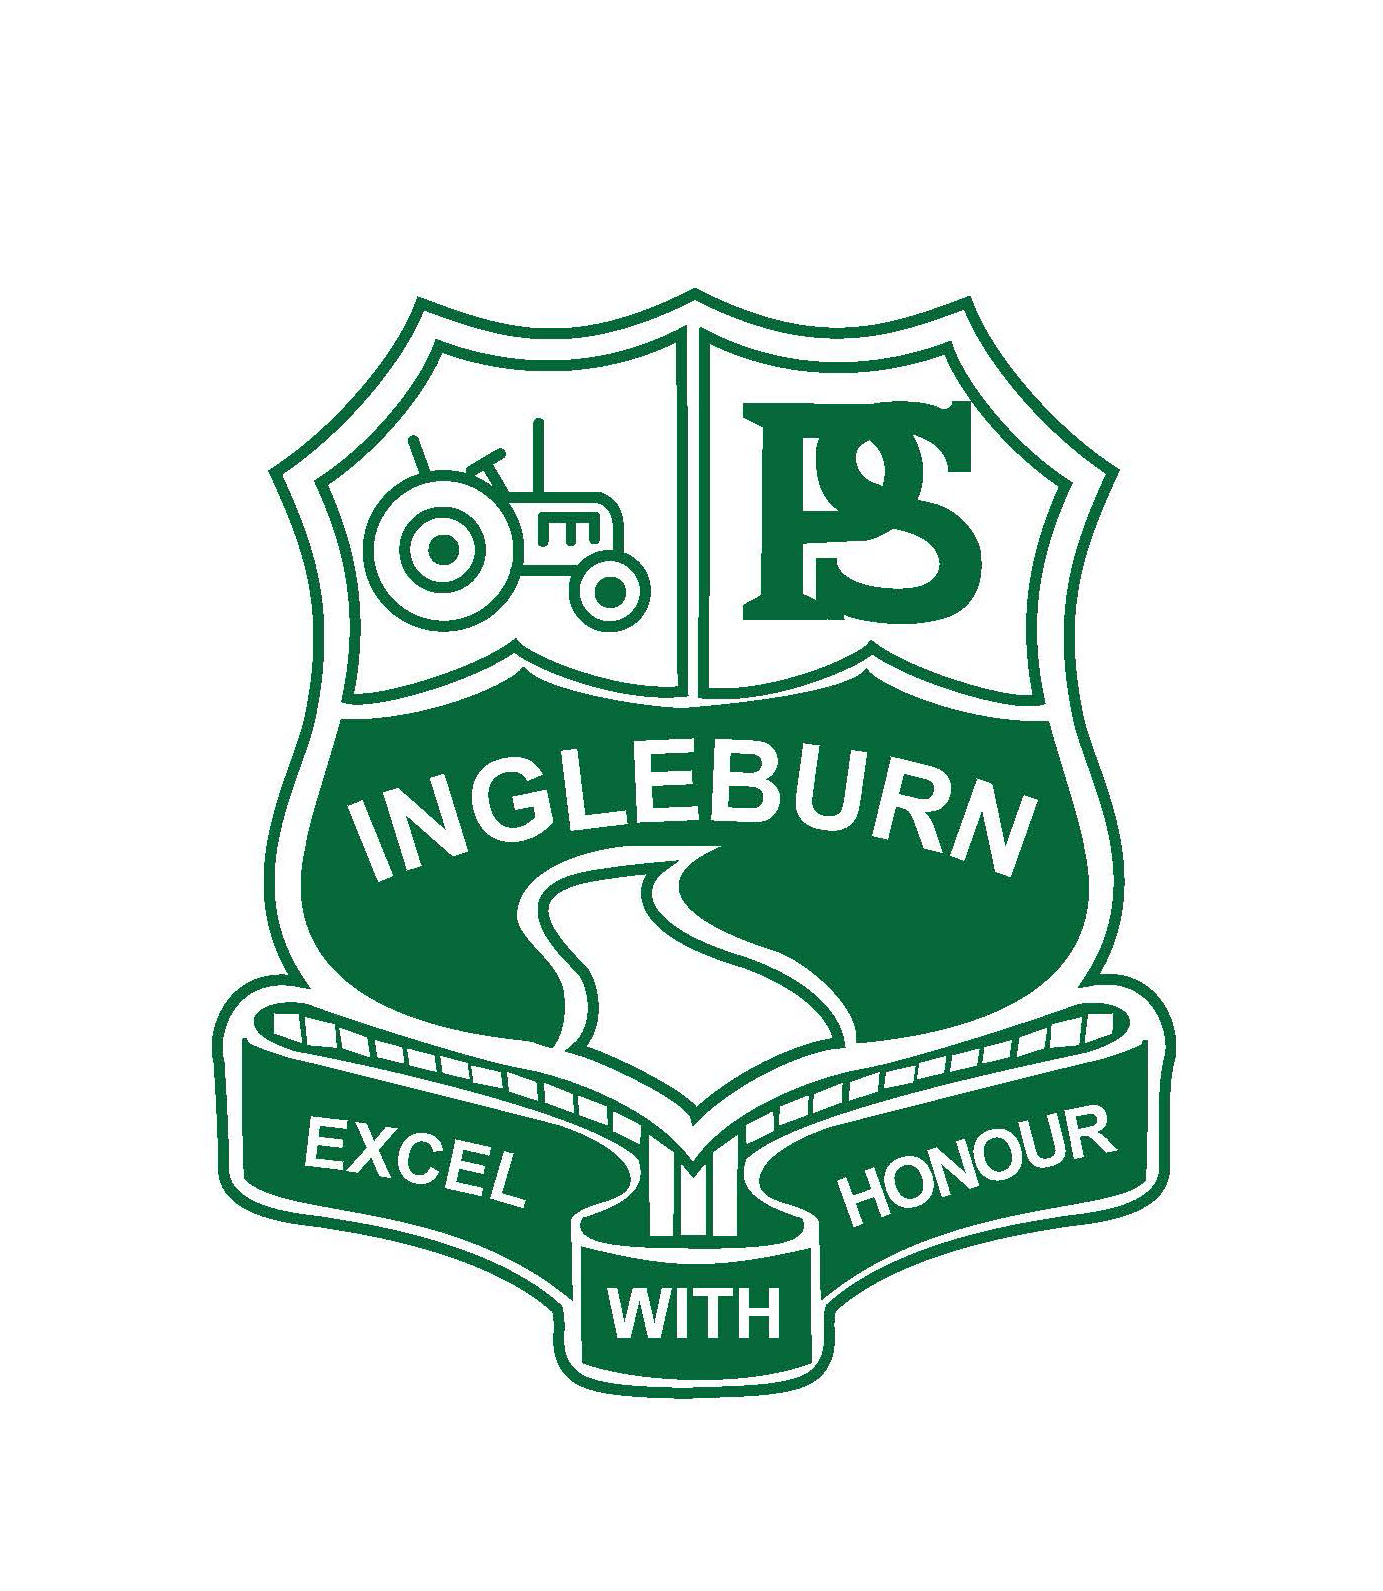 Ingleburn Public School, Ingleburn, NSW